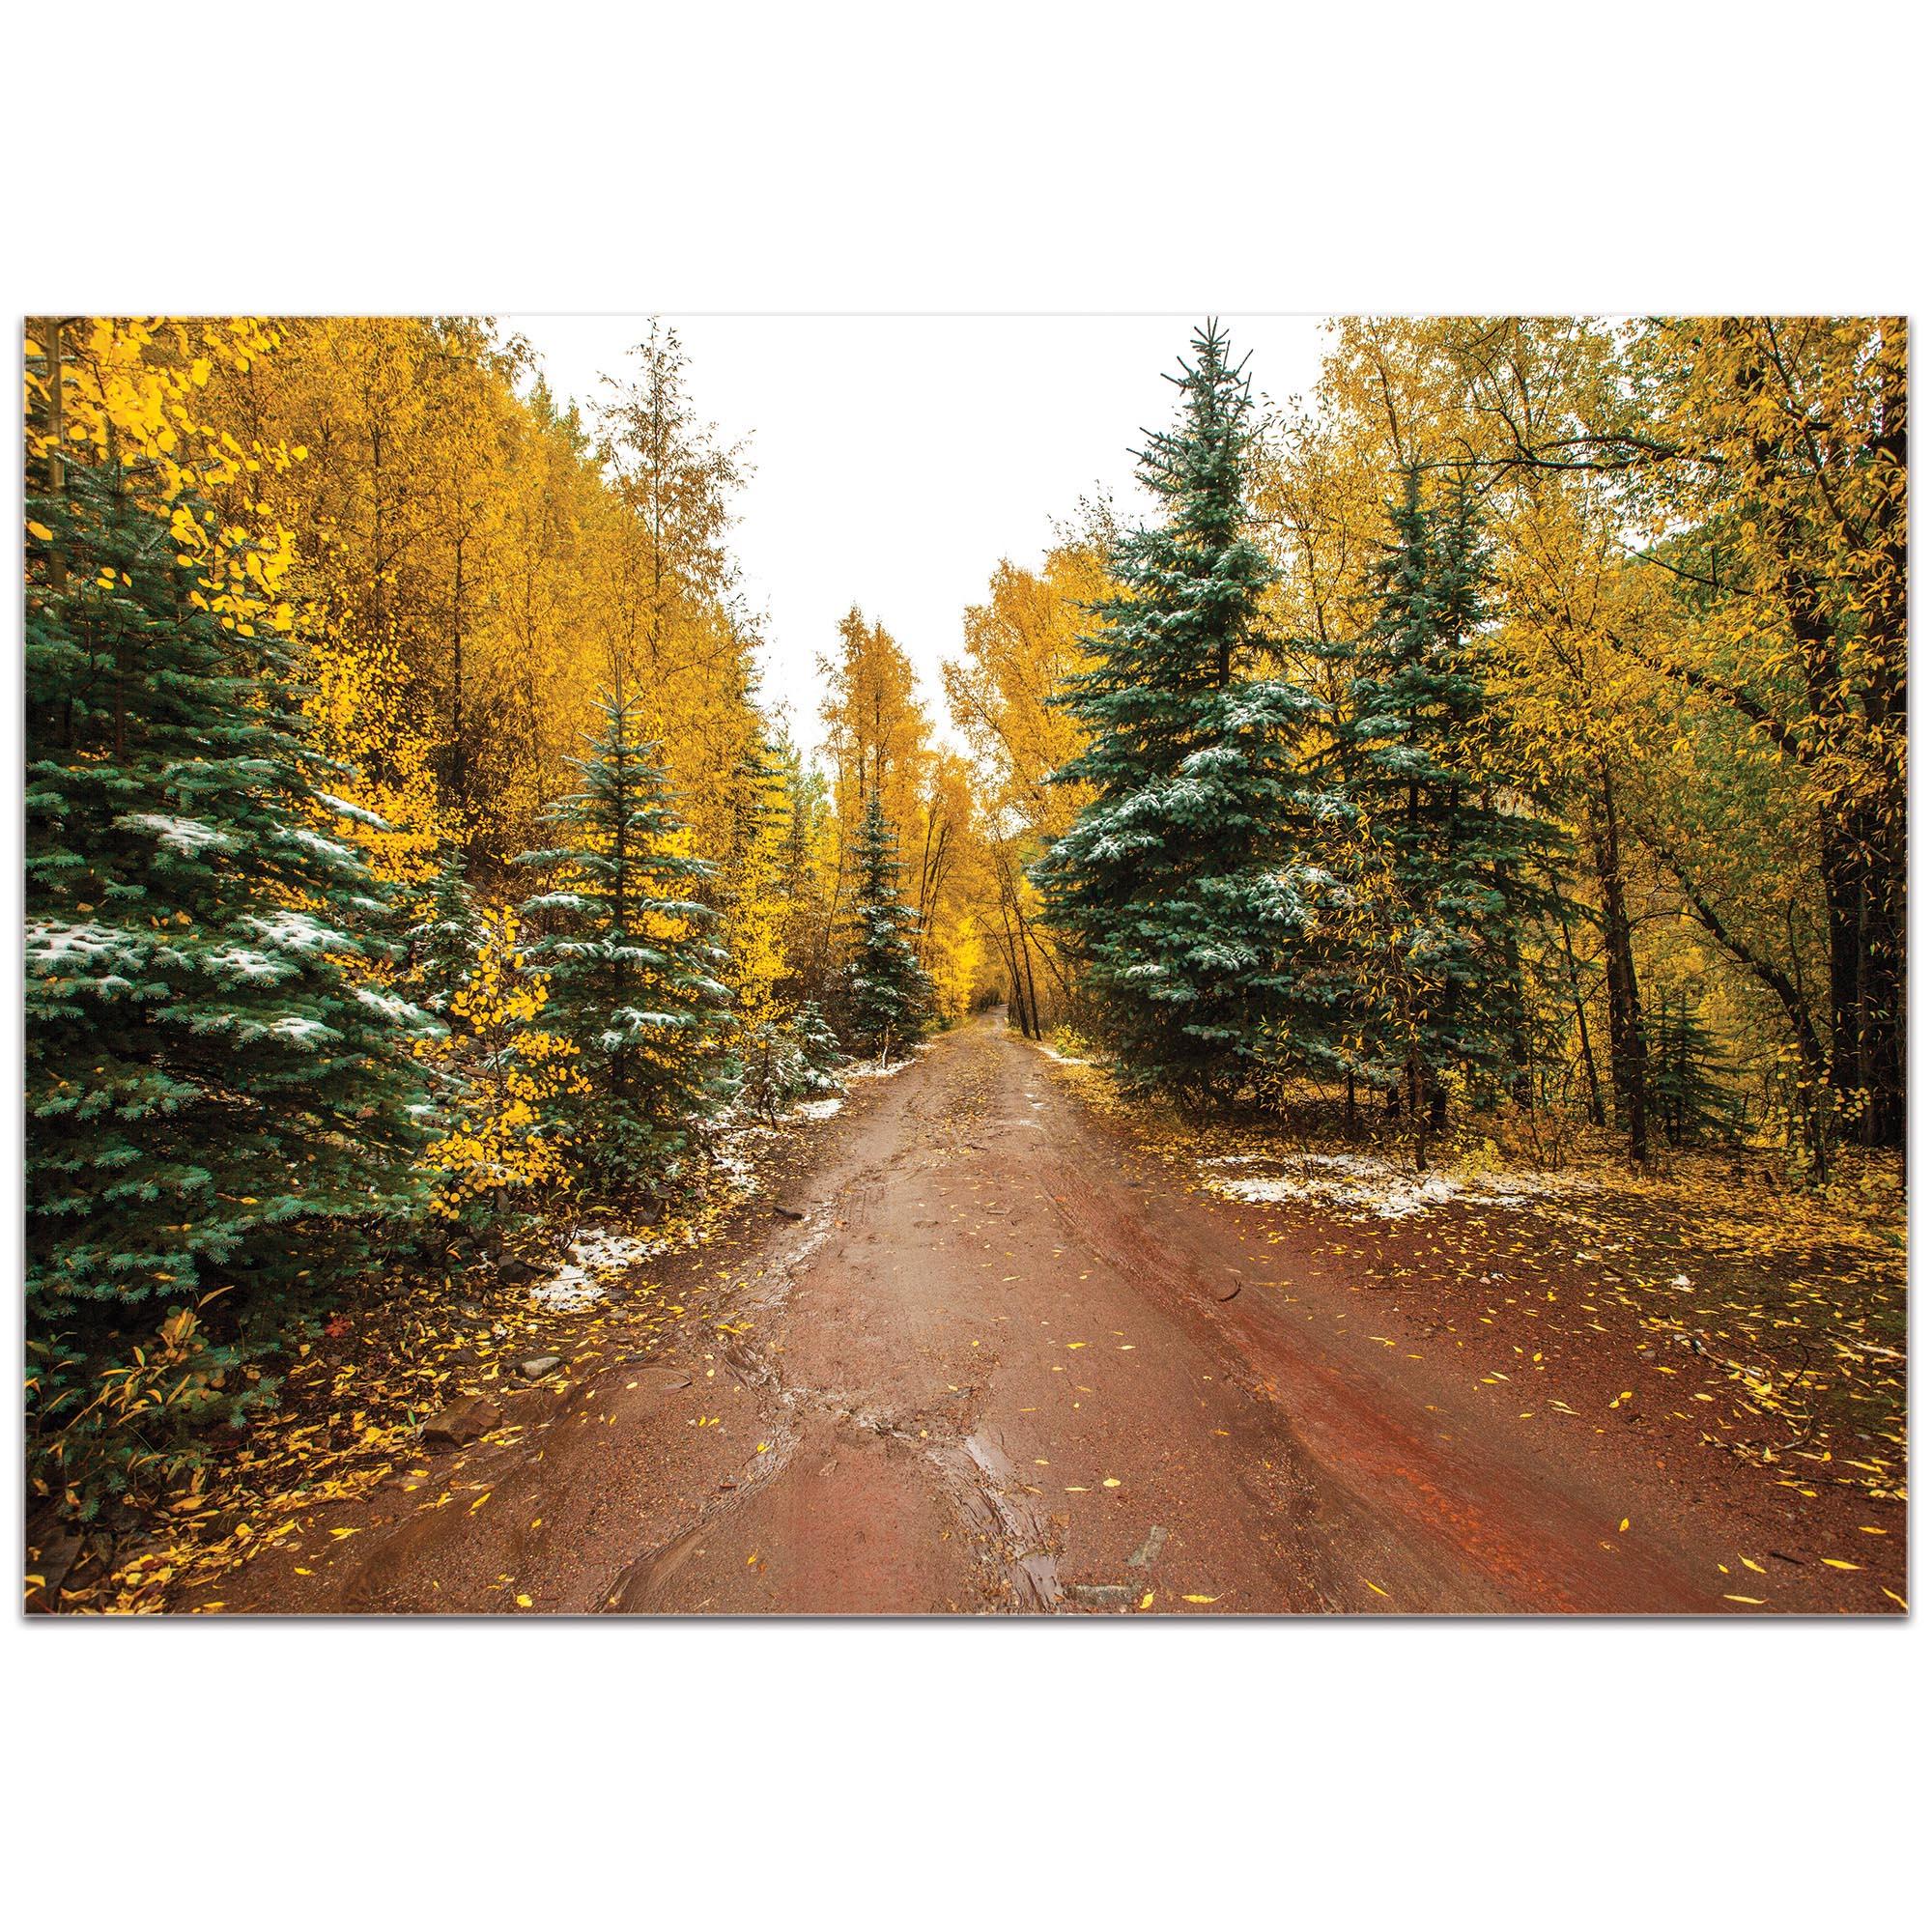 Landscape Photography 'Road Less Traveled' - Autumn Trees Art on Metal or Plexiglass - Image 2